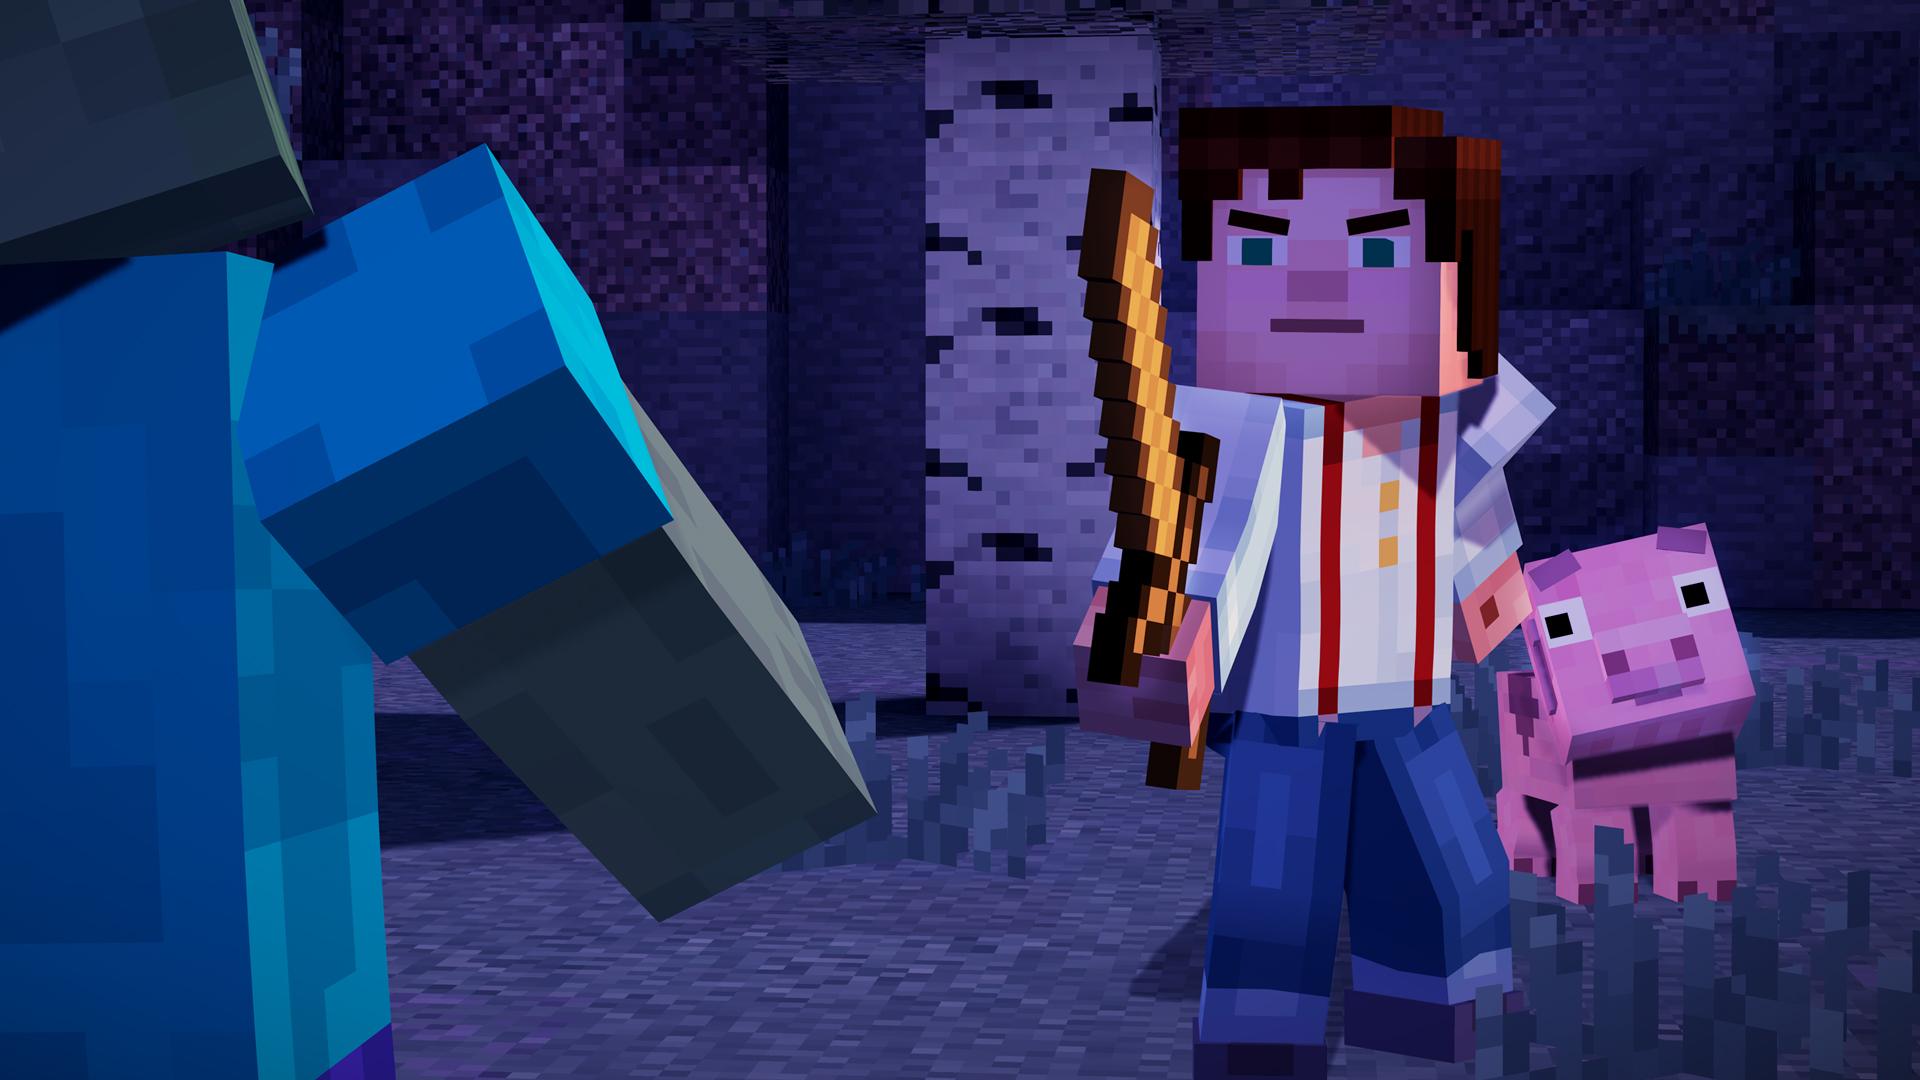 Скачать Minecraft Story Mod 2 сезон - modmcpe.net